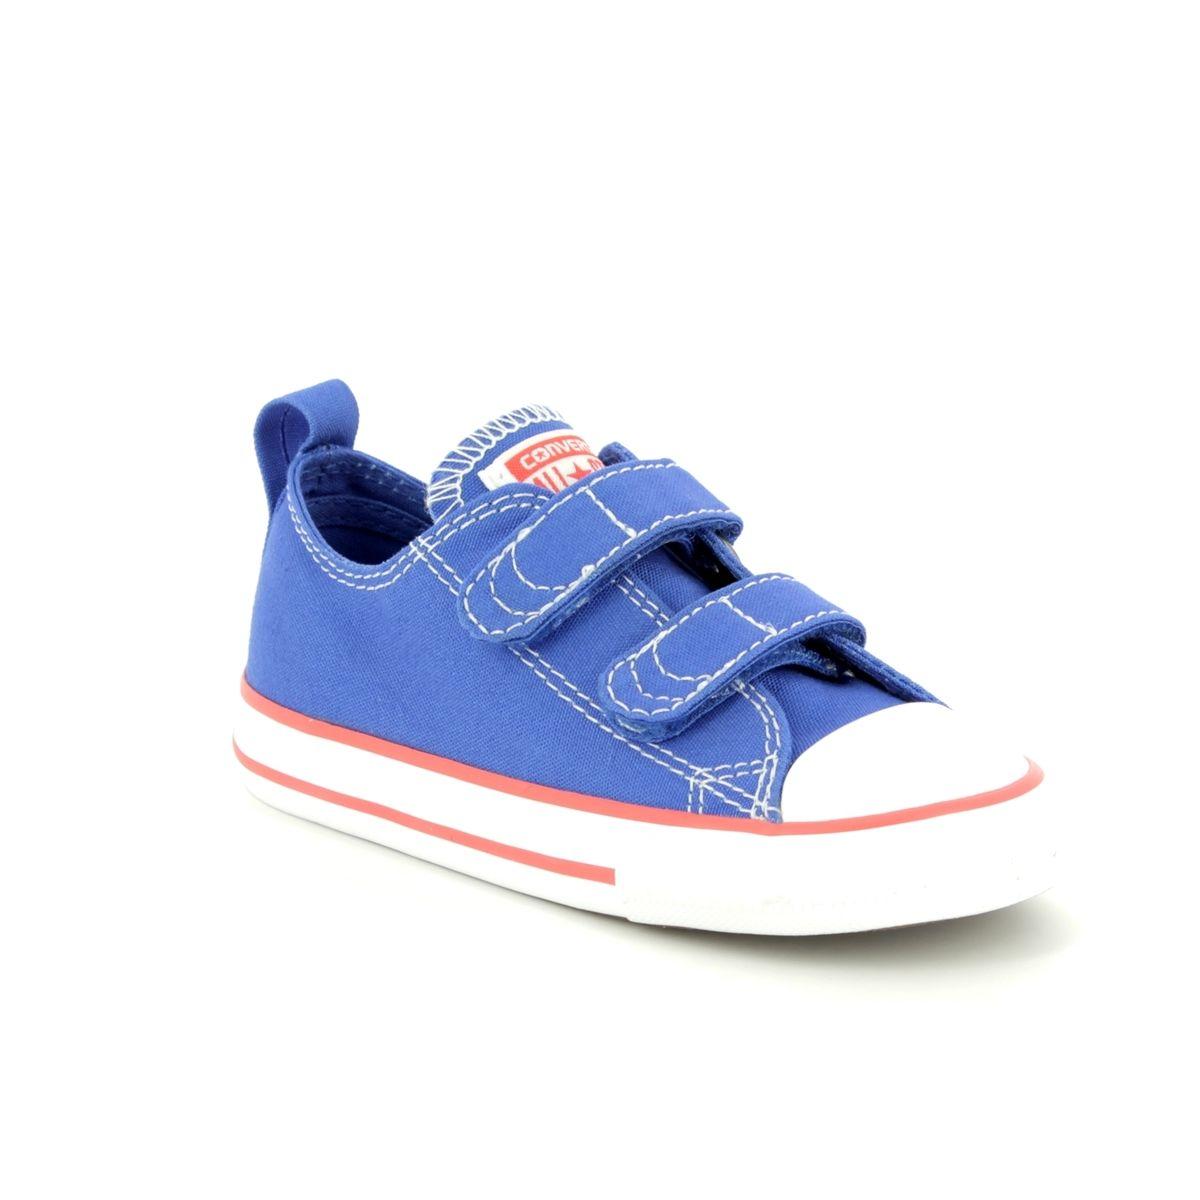 b9fae83fdf4bd3 Converse All Star Ox Velcro Infants 760050C Blue Kids trainers